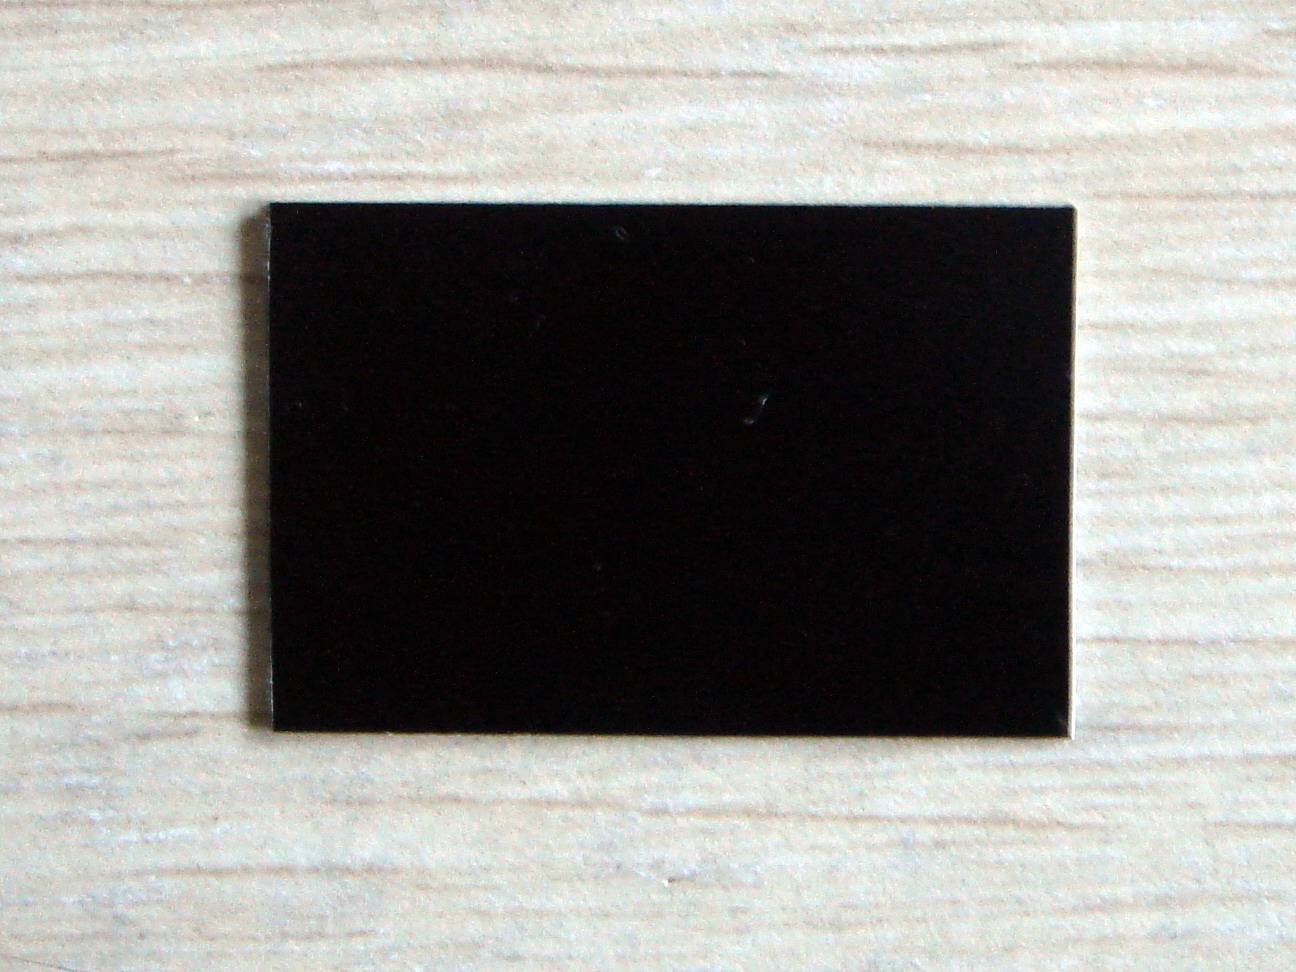 Sell Utax LP-3235 toner chip